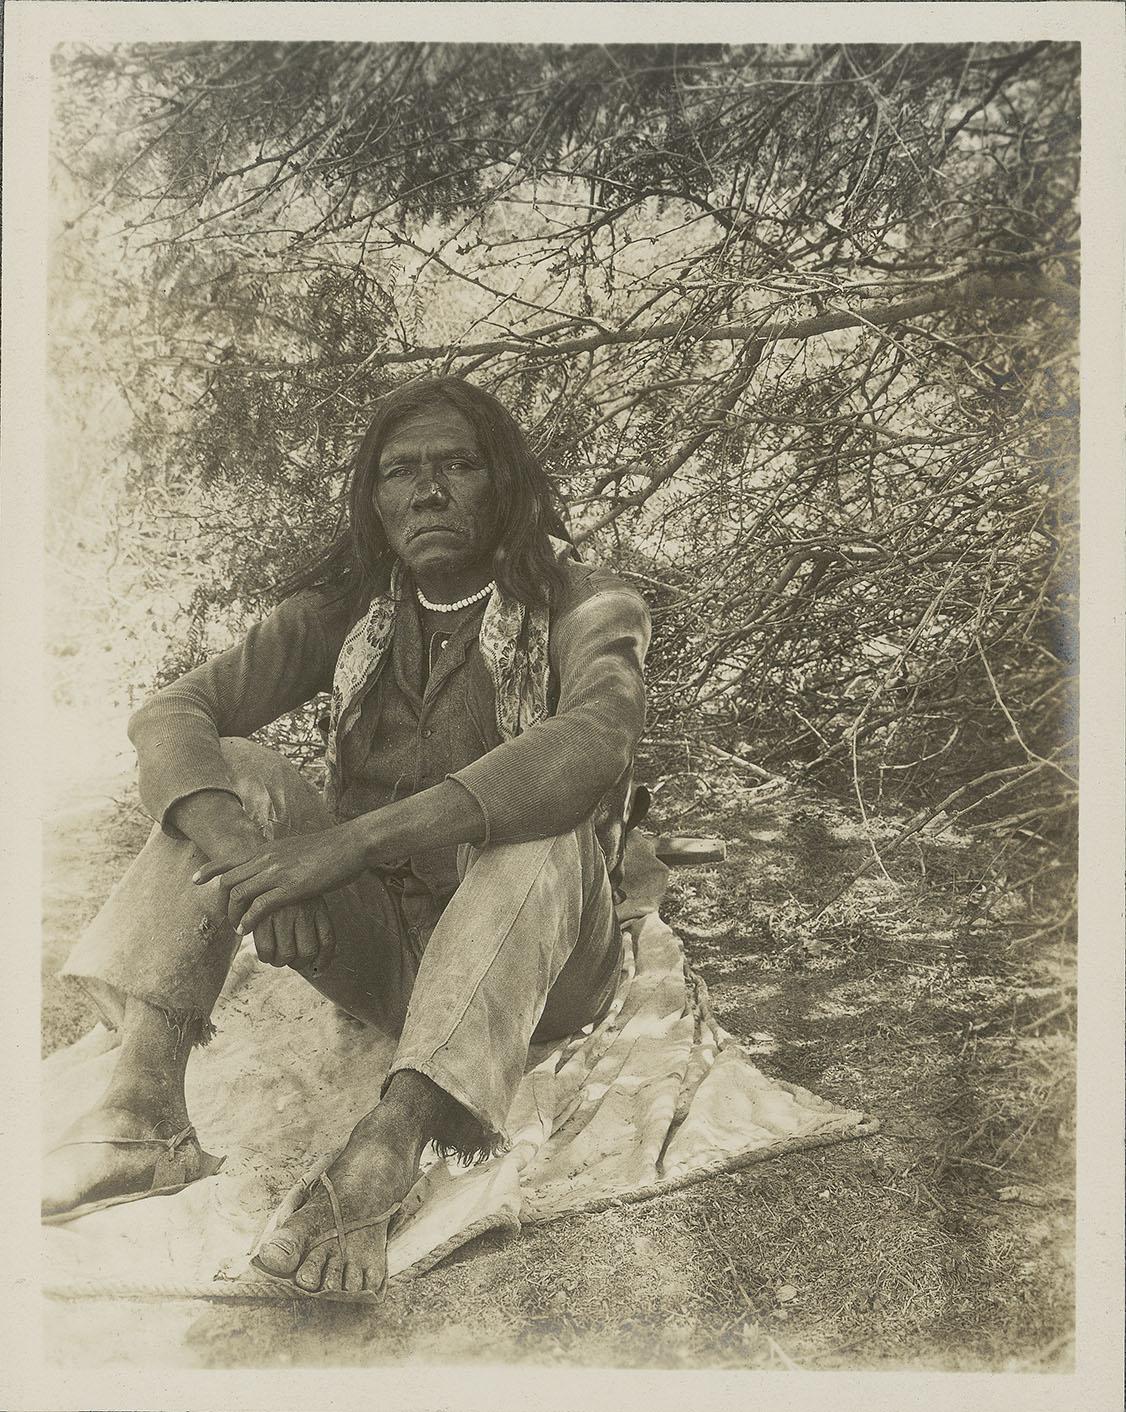 Cocopah Indian_Cocopah Mountains, Lower California c. 1905.jpg